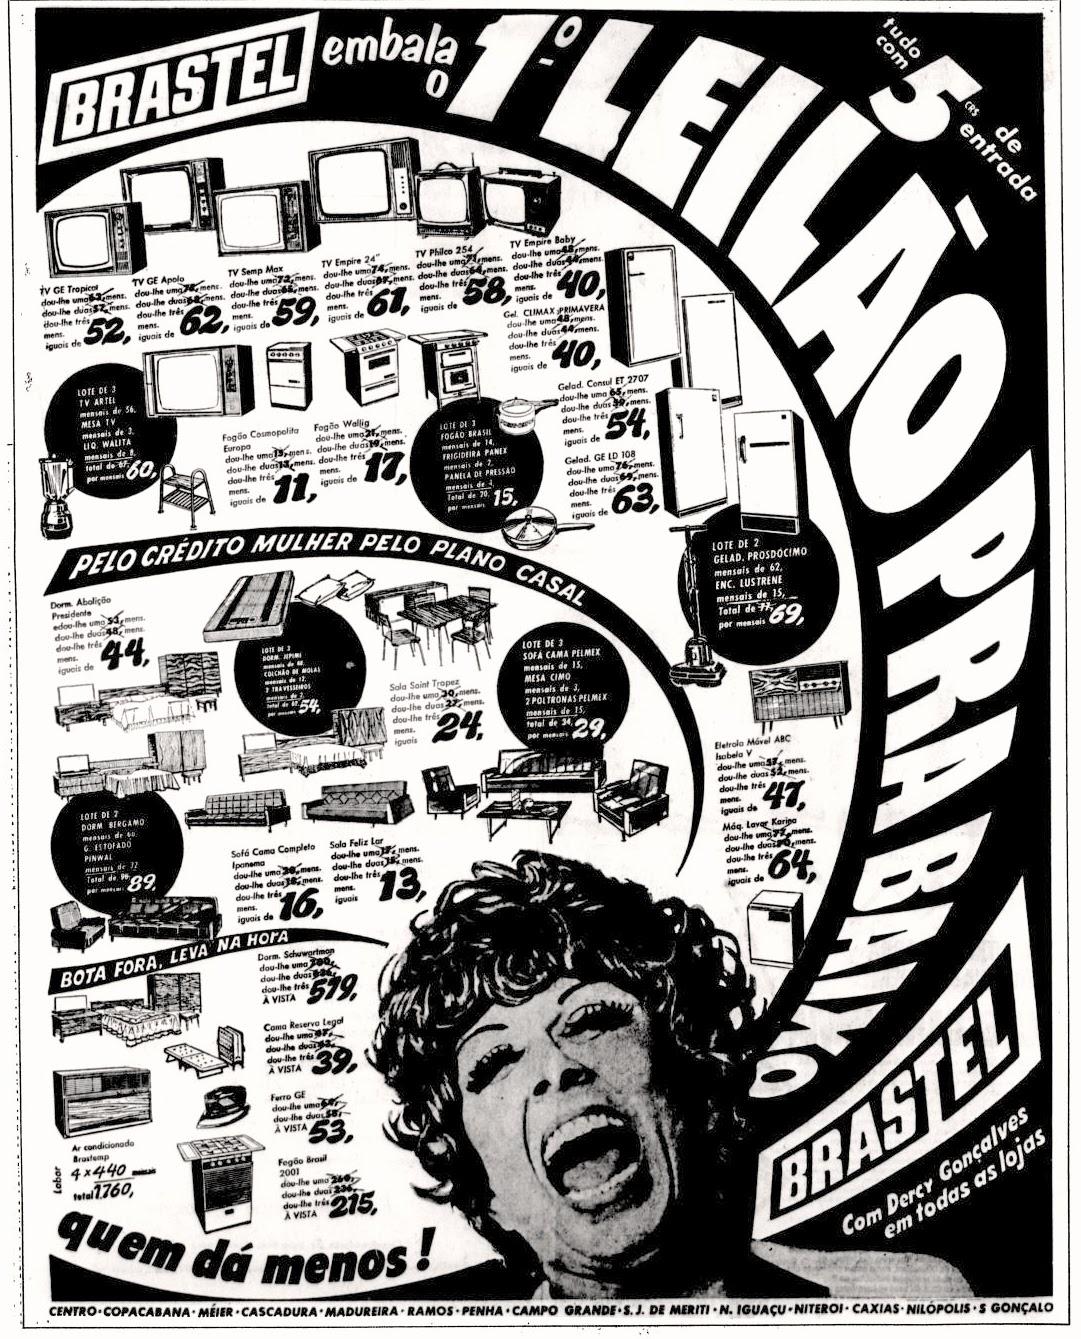 Dercy Gonçalves;  1971; os anos 70; propaganda na década de 70; Brazil in the 70s, história anos 70; Oswaldo Hernandez;